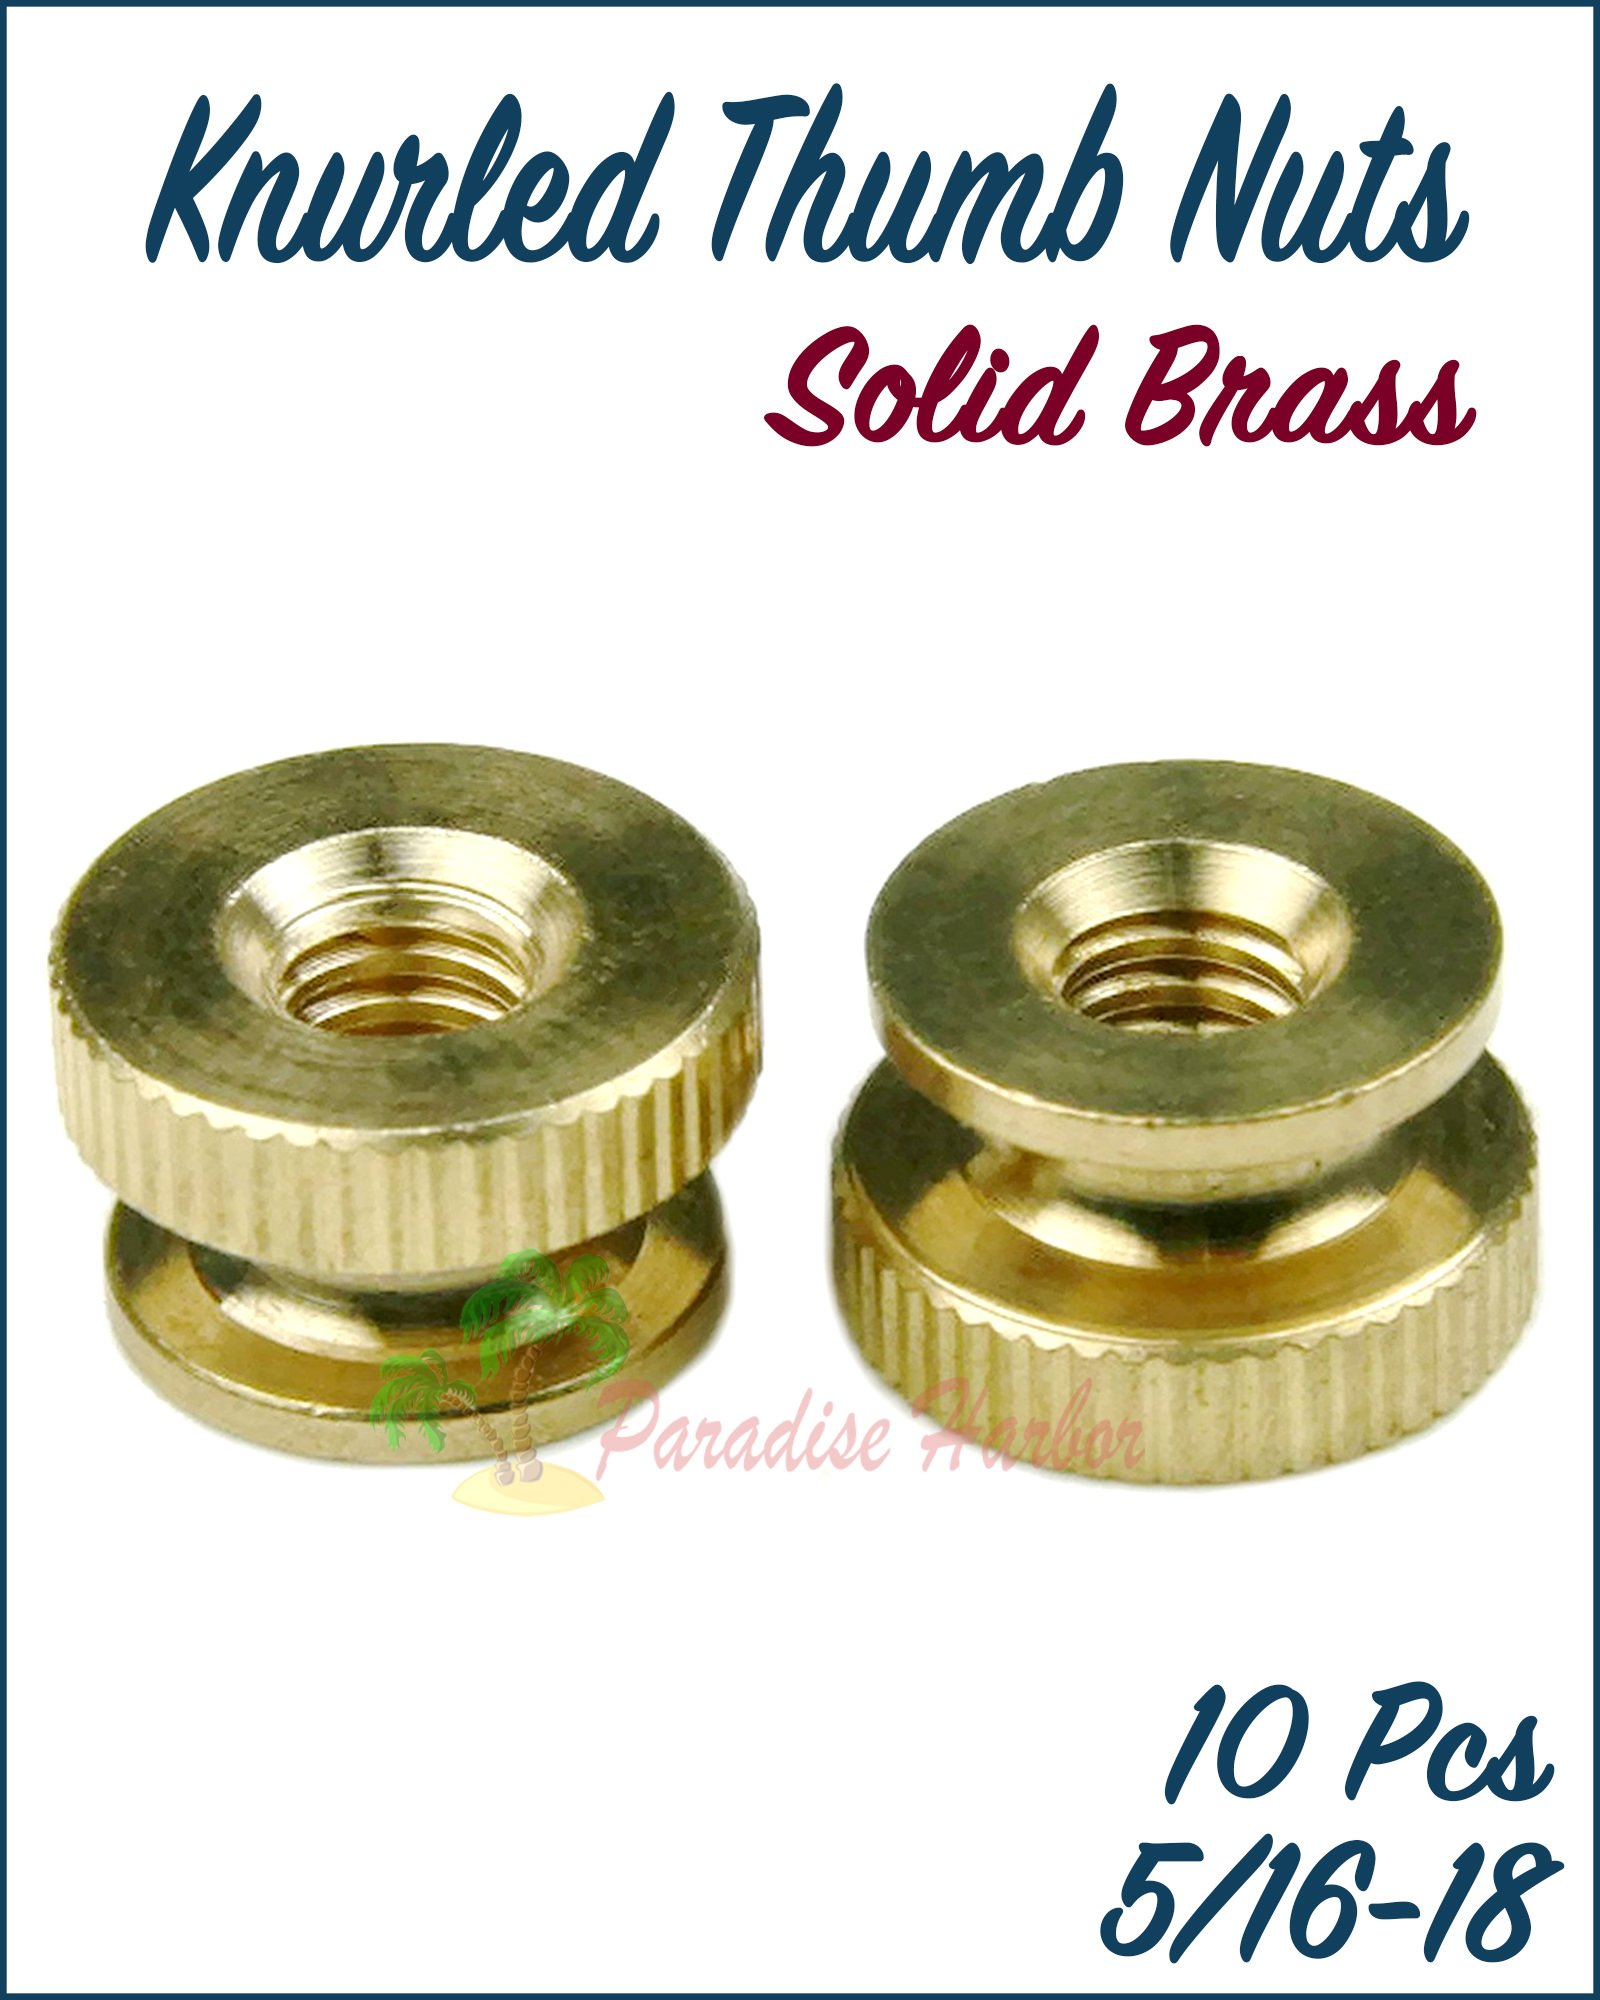 Paradise Harbor 10 Pcs 5/16-18 Knurled Thumb Nuts Solid Brass Knurled Thumb Nuts by Paradise Harbor